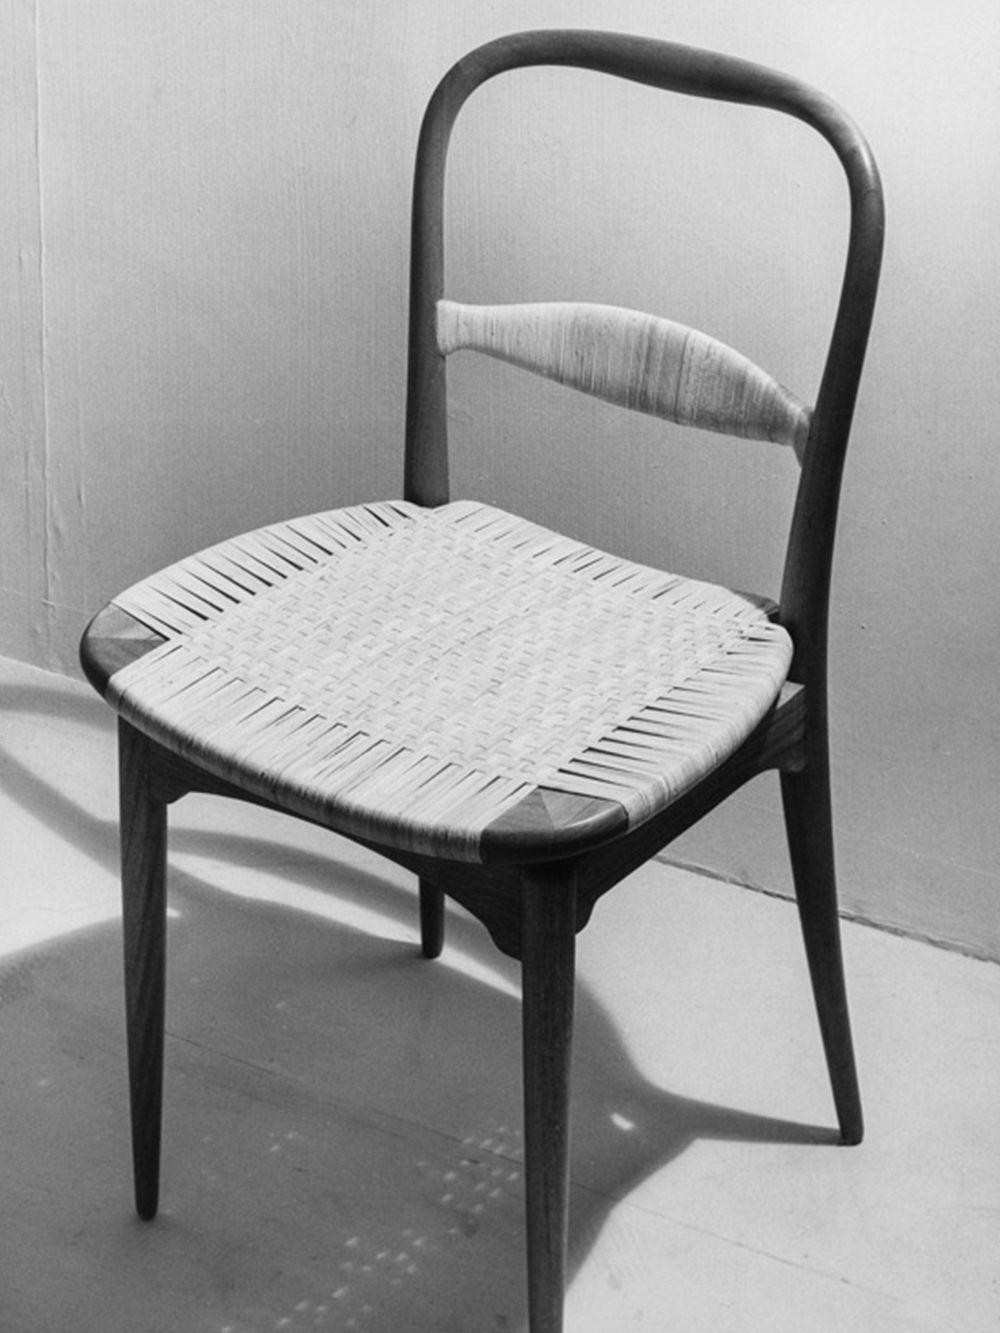 Chair by Carin Bryggman